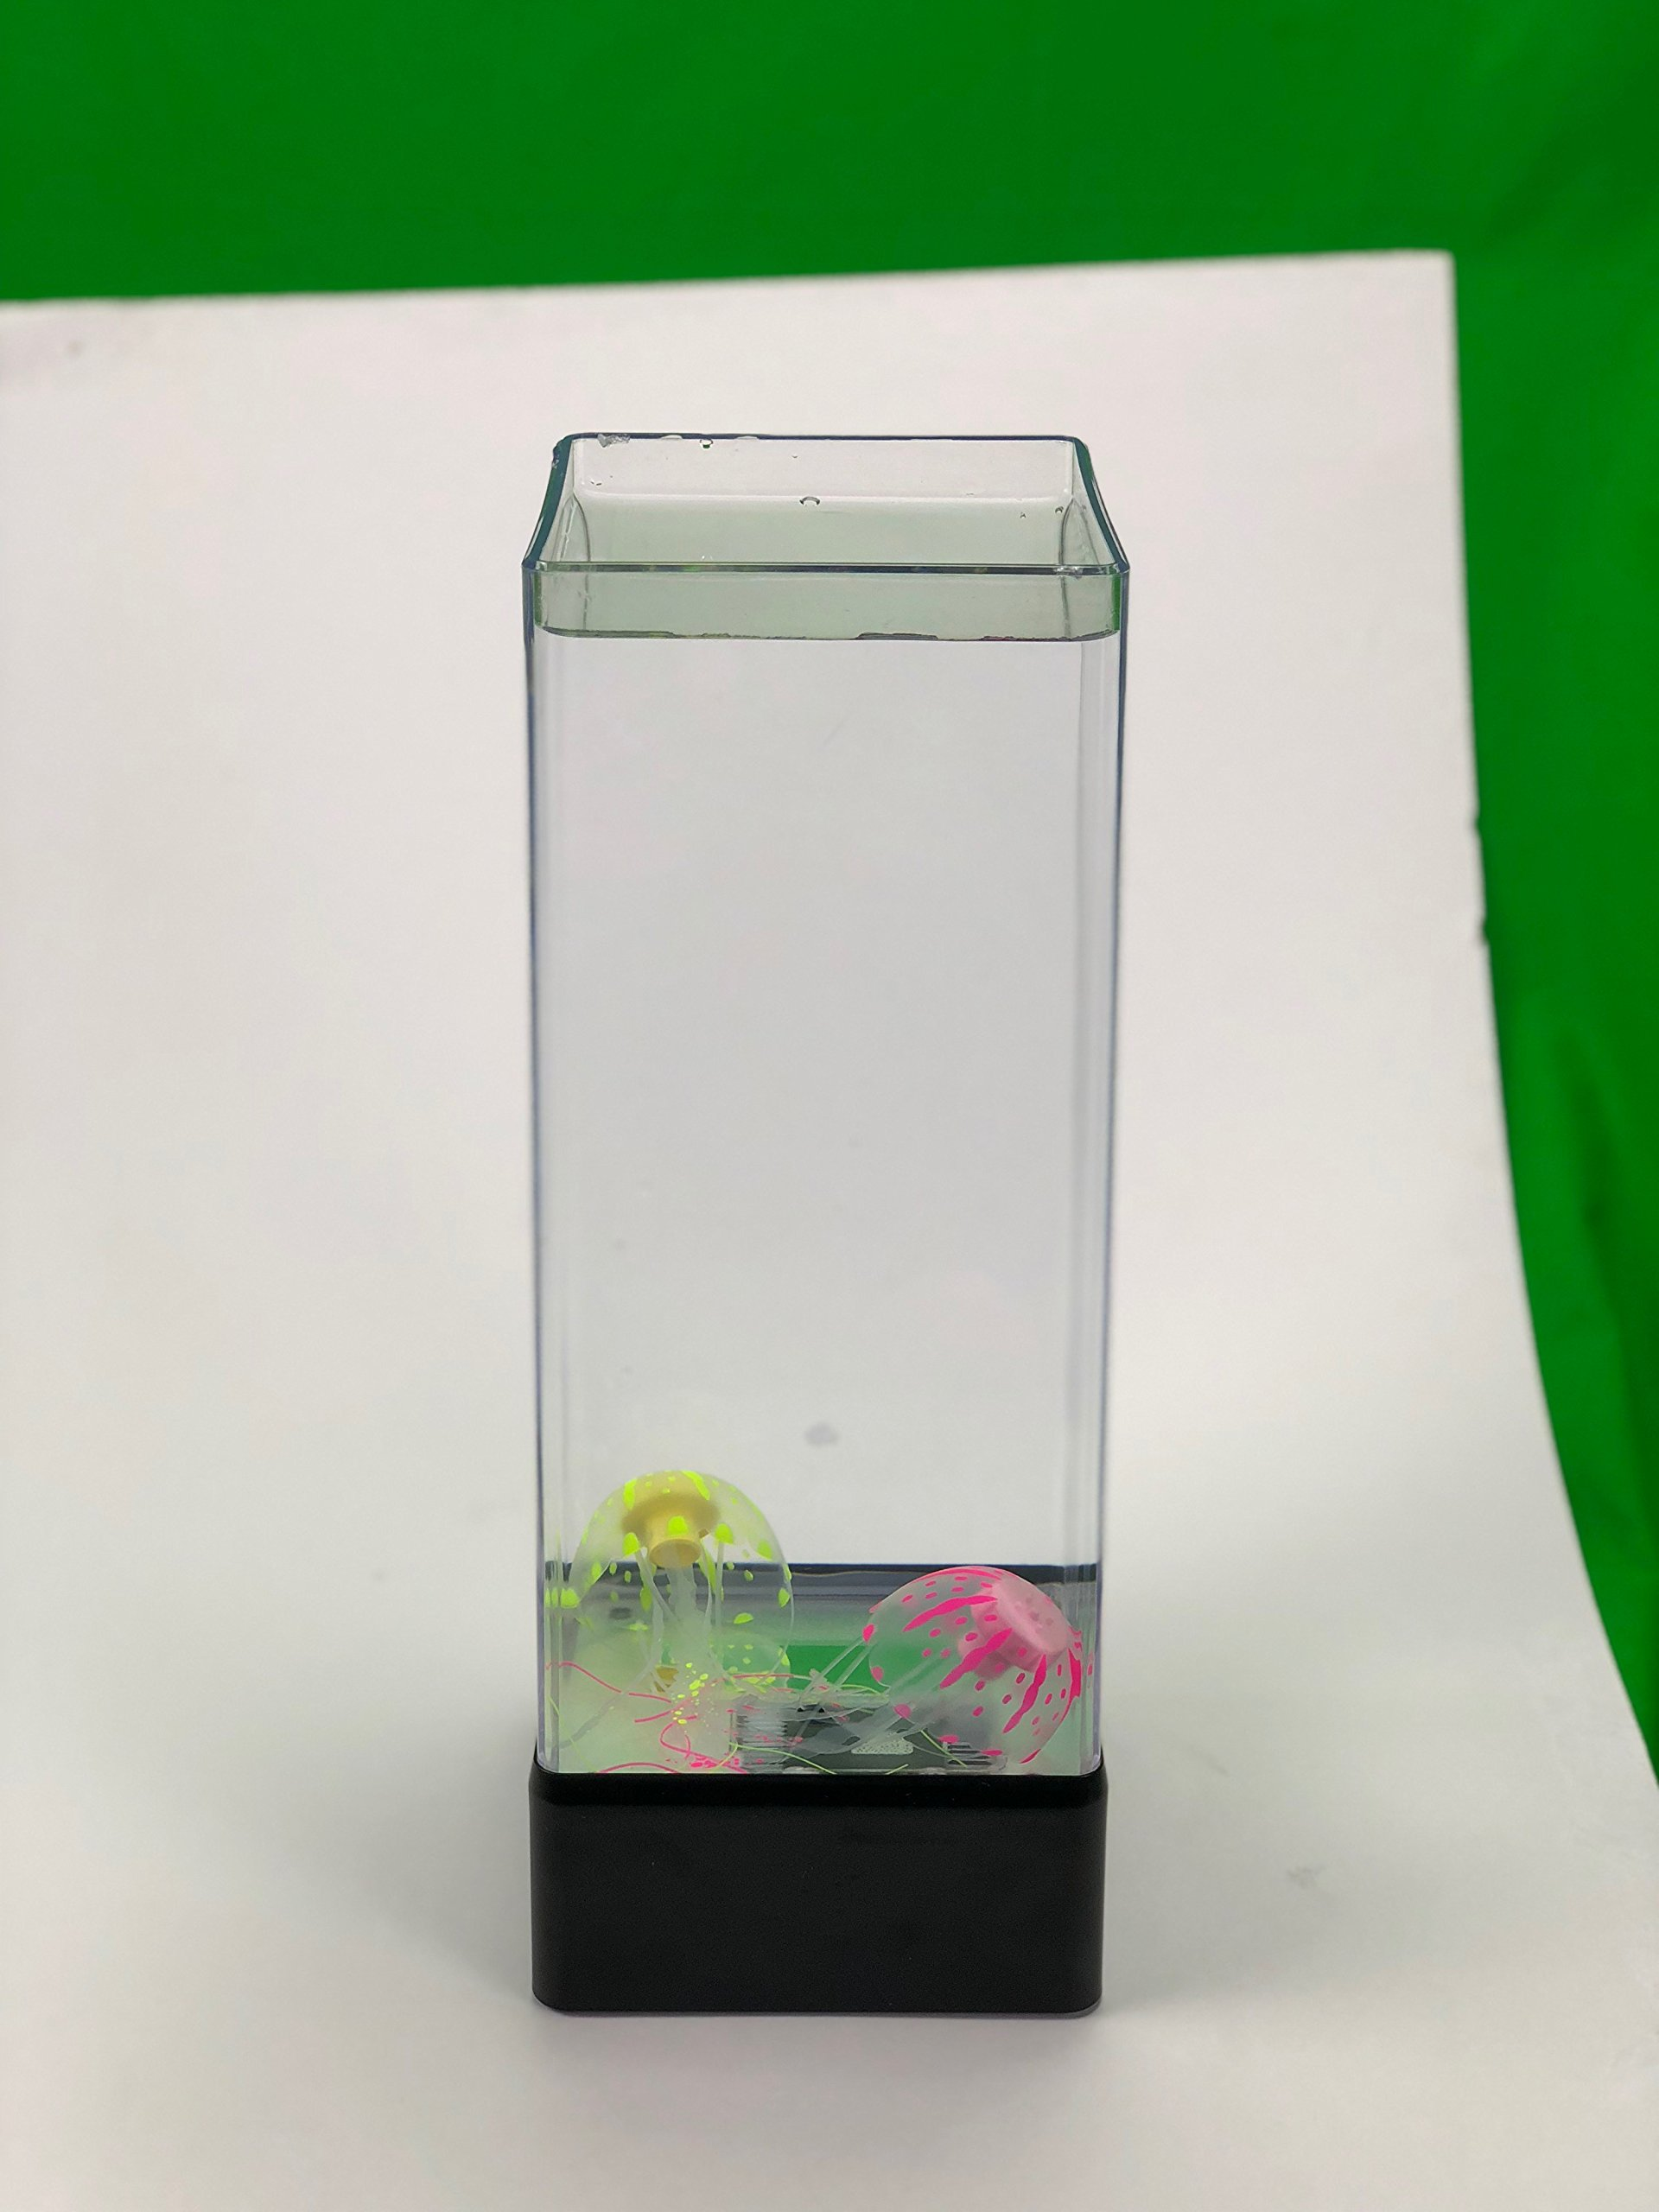 Jellyfish Aquarium Mood Lamp - 2 Artificial Jellyfish Swim Above 6 LED Lights, Perfect Night Light for Kids